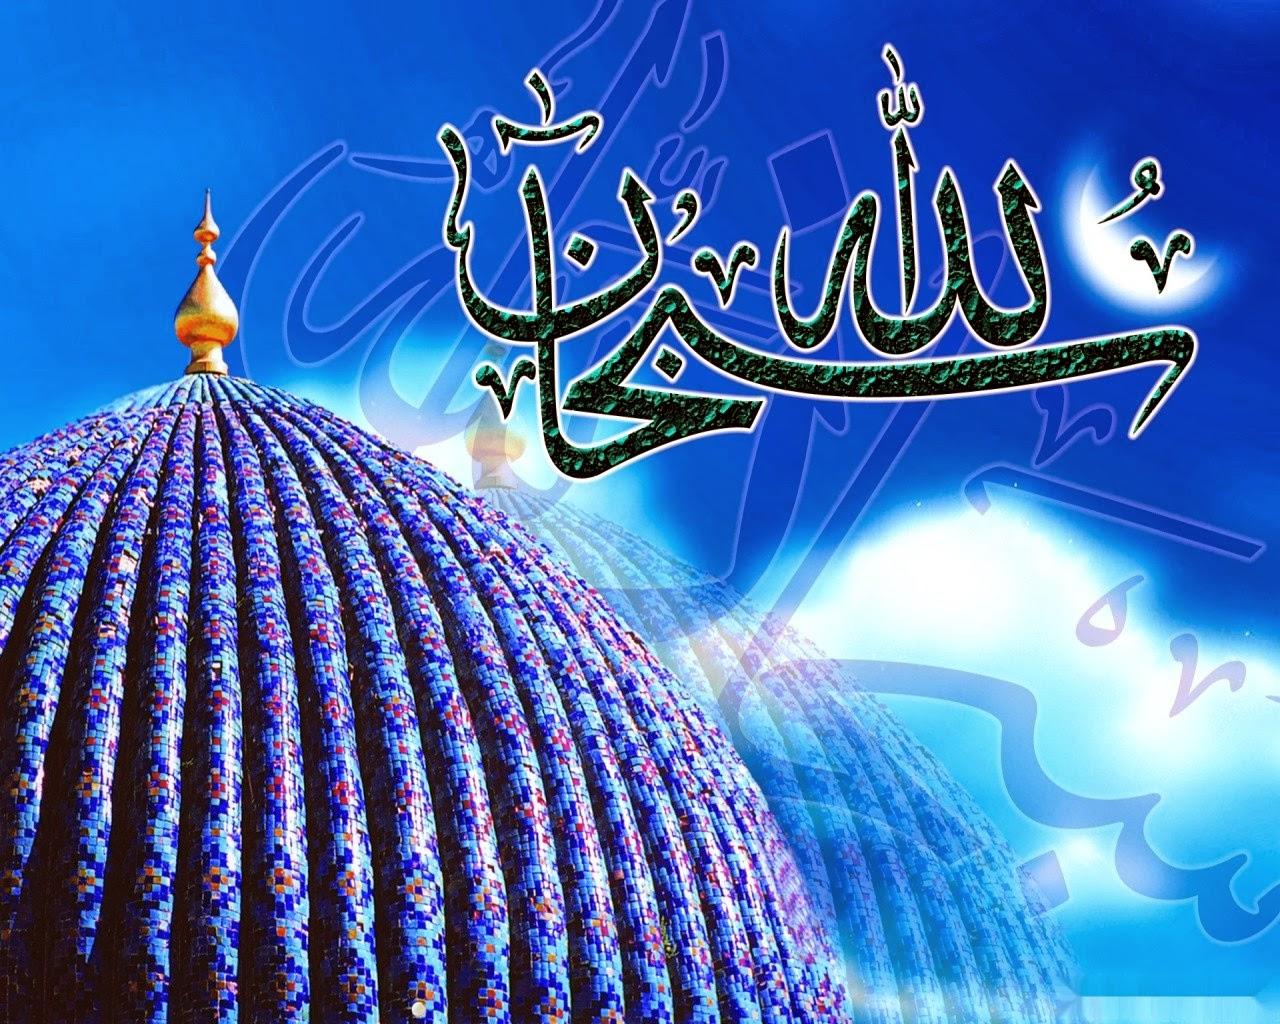 Allah Muhammad Wallpaper Animation Allah Wallpapers Allah Desktop Wallpapers Gods Paradise